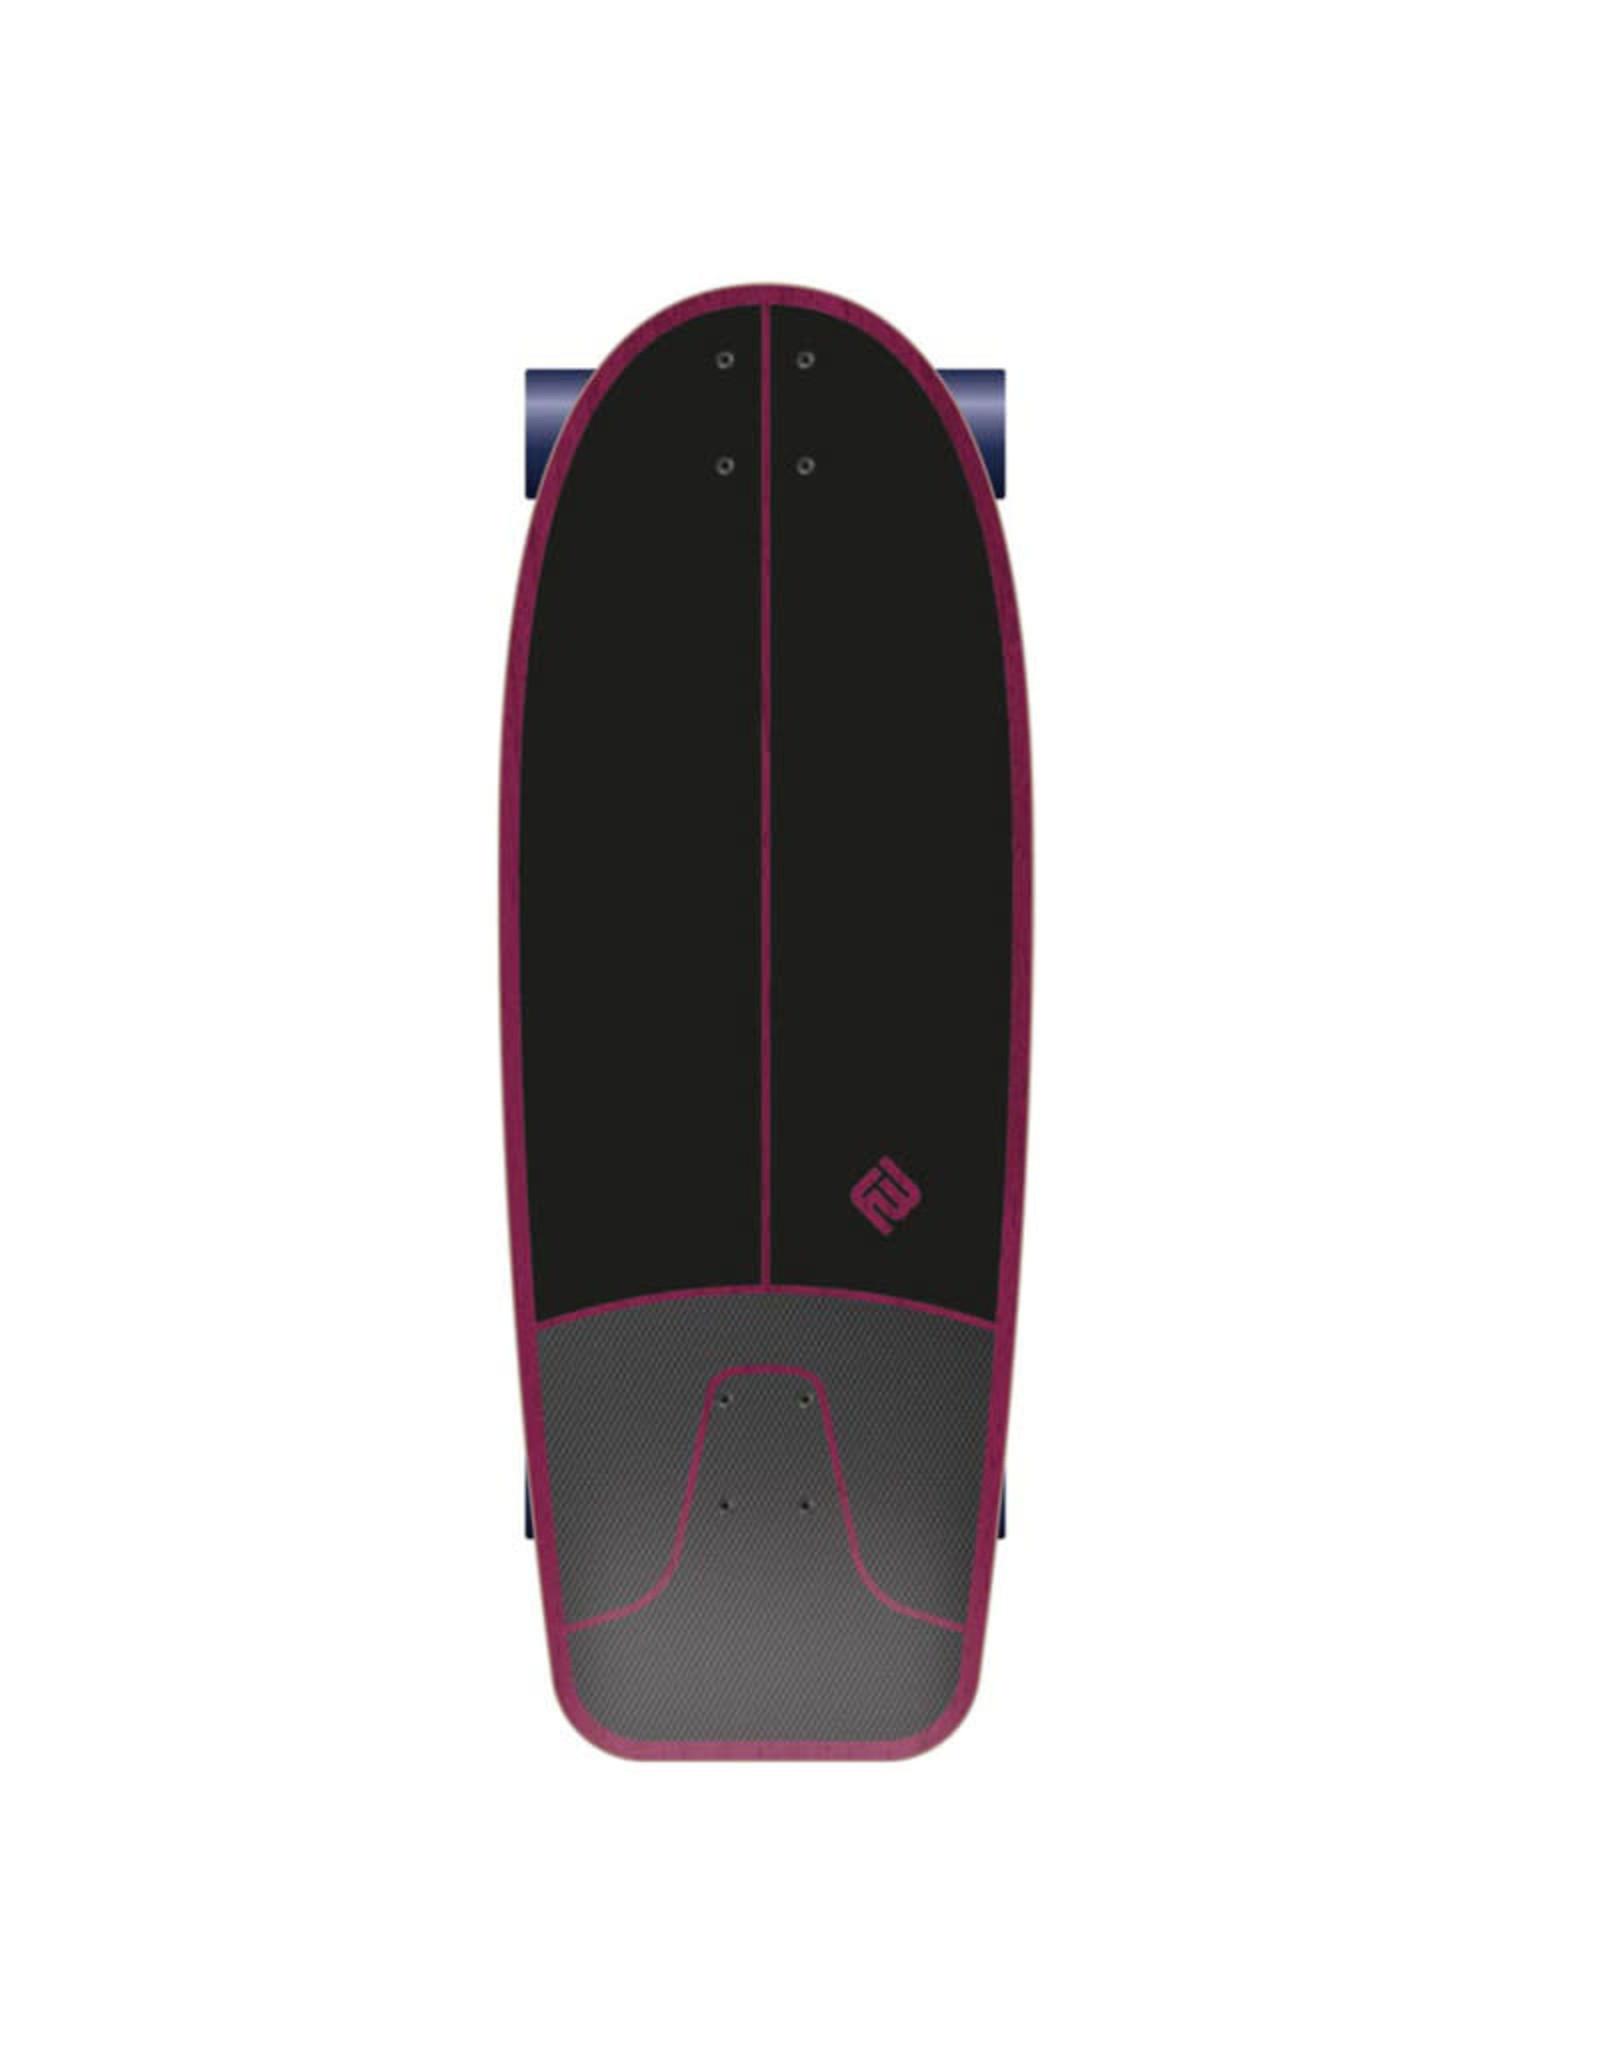 Flying Wheels Flying Wheels Surf Carver Skateboard 29 Rad